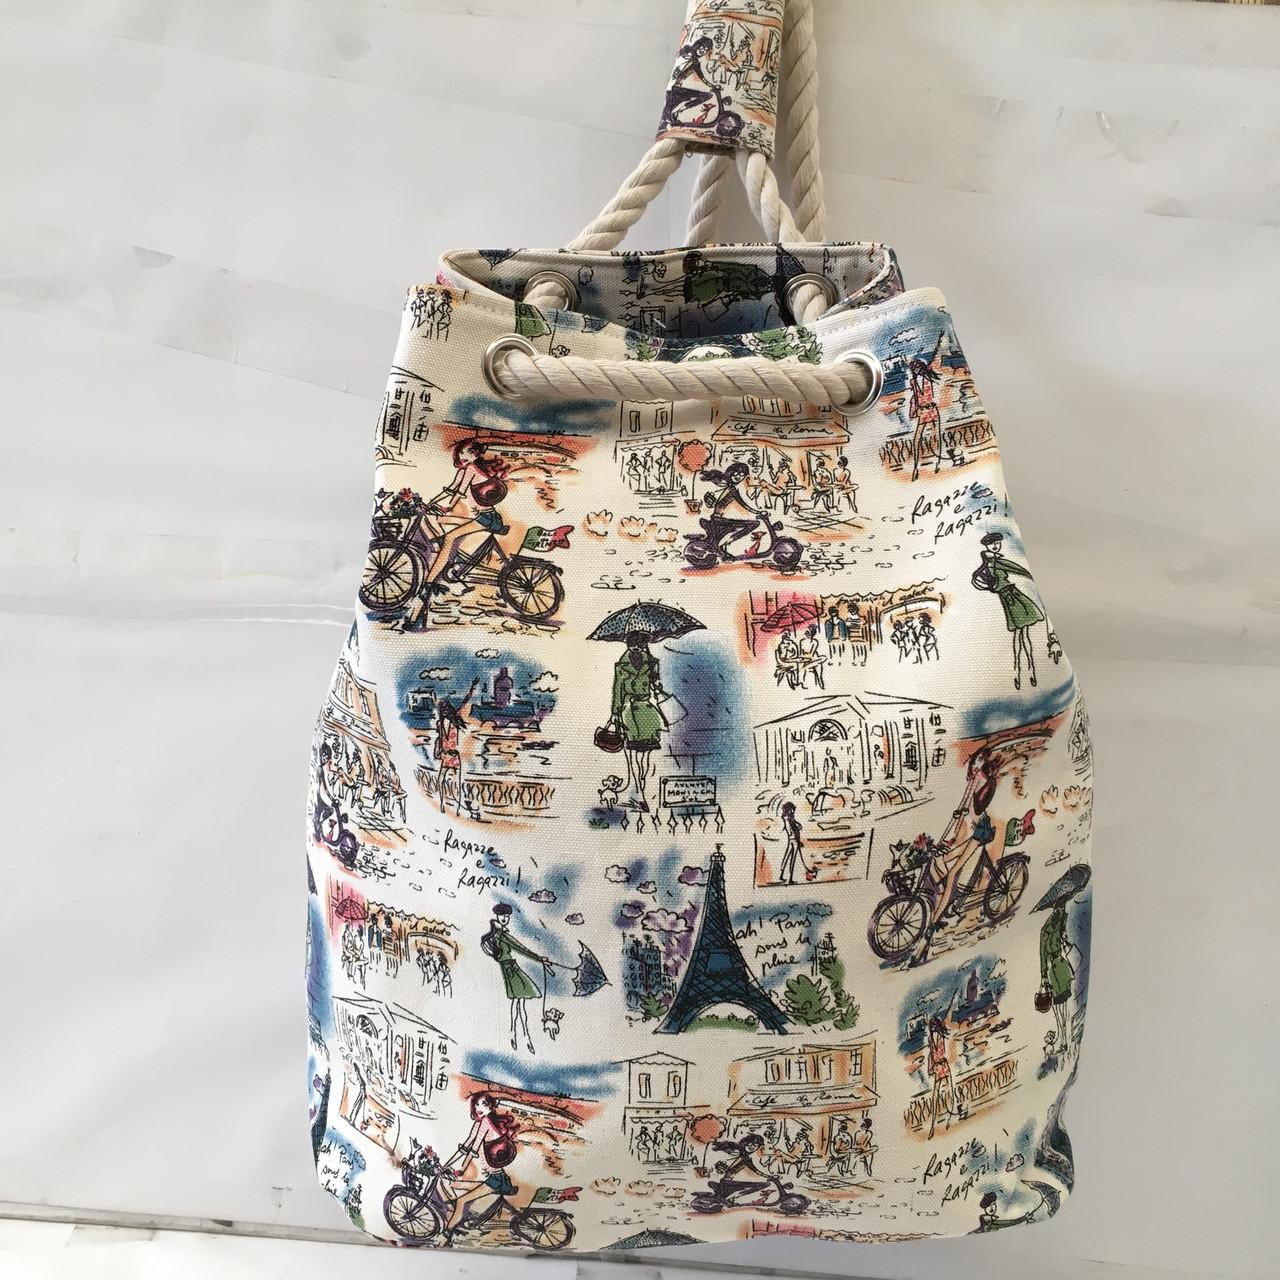 1c4d0979a75c Пляжная летняя сумка рюкзак Индия оптом : продажа, цена в Харькове ...